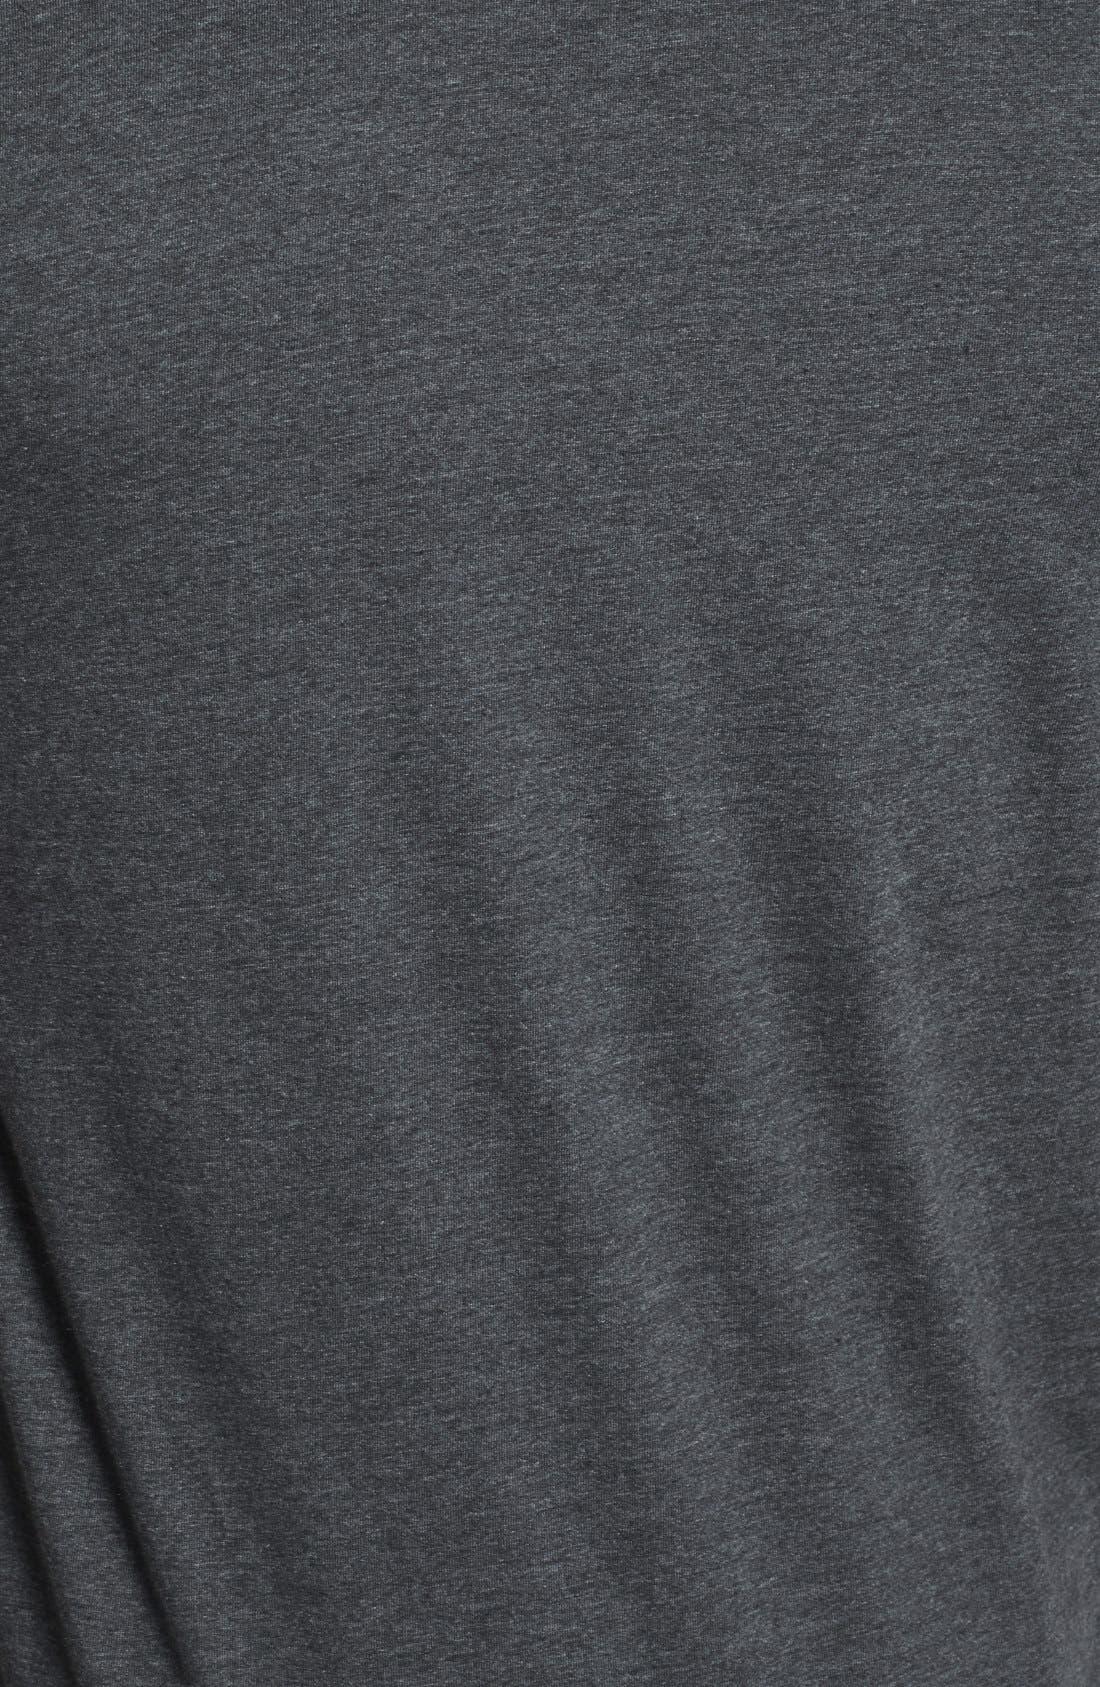 Alternate Image 3  - Kid Dangerous 'Sunday Funday' Graphic T-Shirt